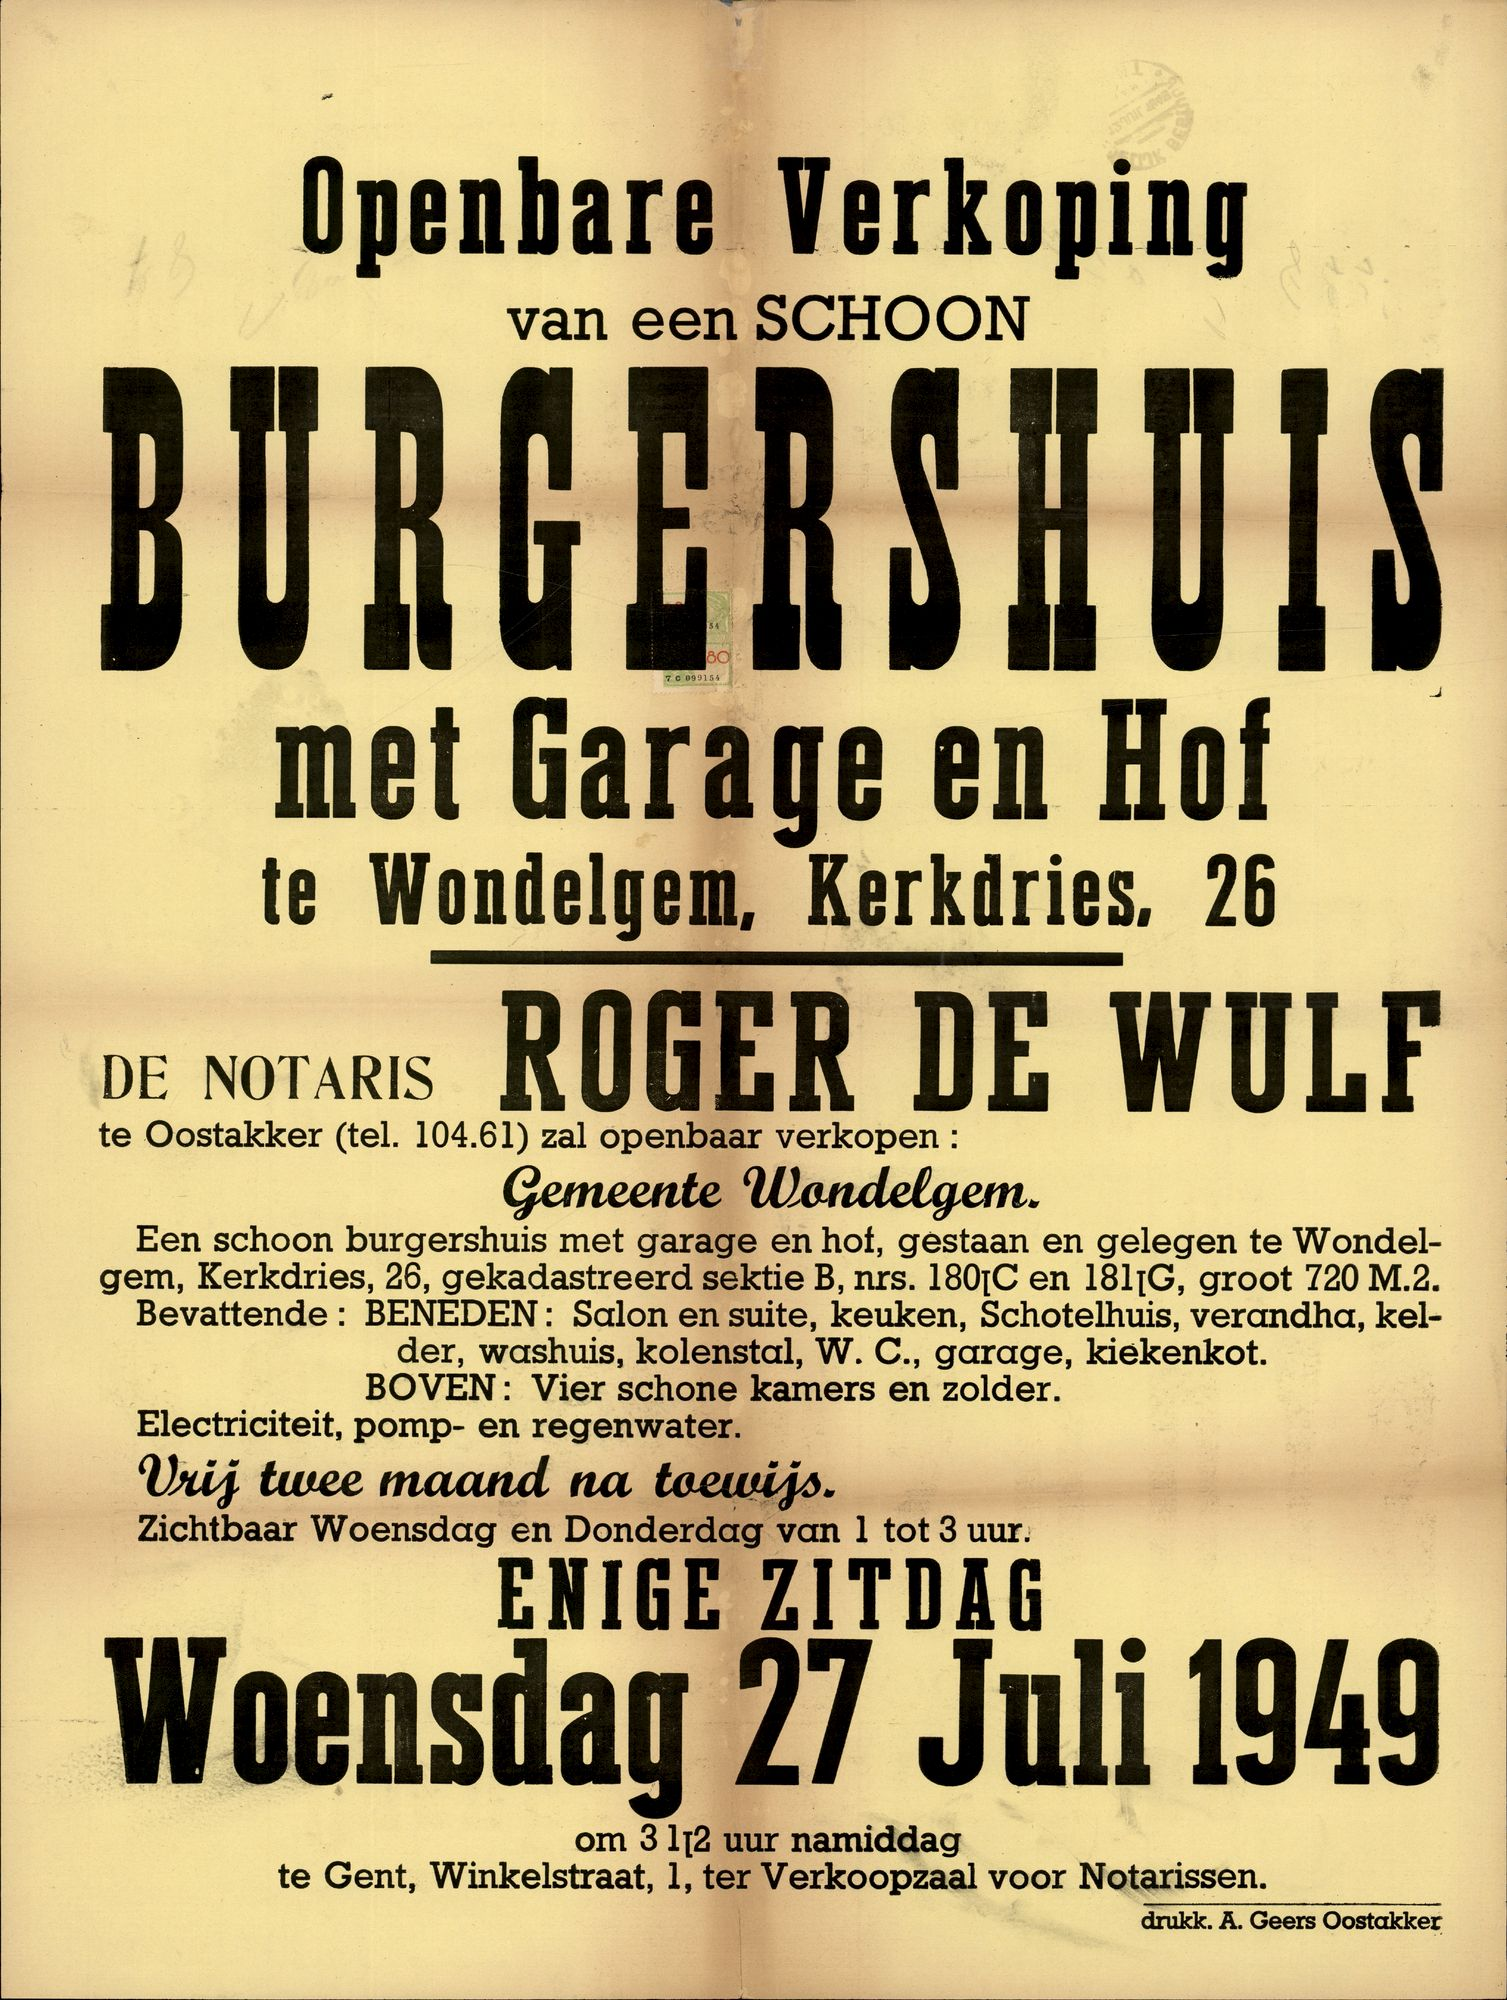 Openbare verkoop van een schoon burgershuis met garage en hof te Wondelgem, Kerkdries, nr.26, Gent, 27 juli 1949